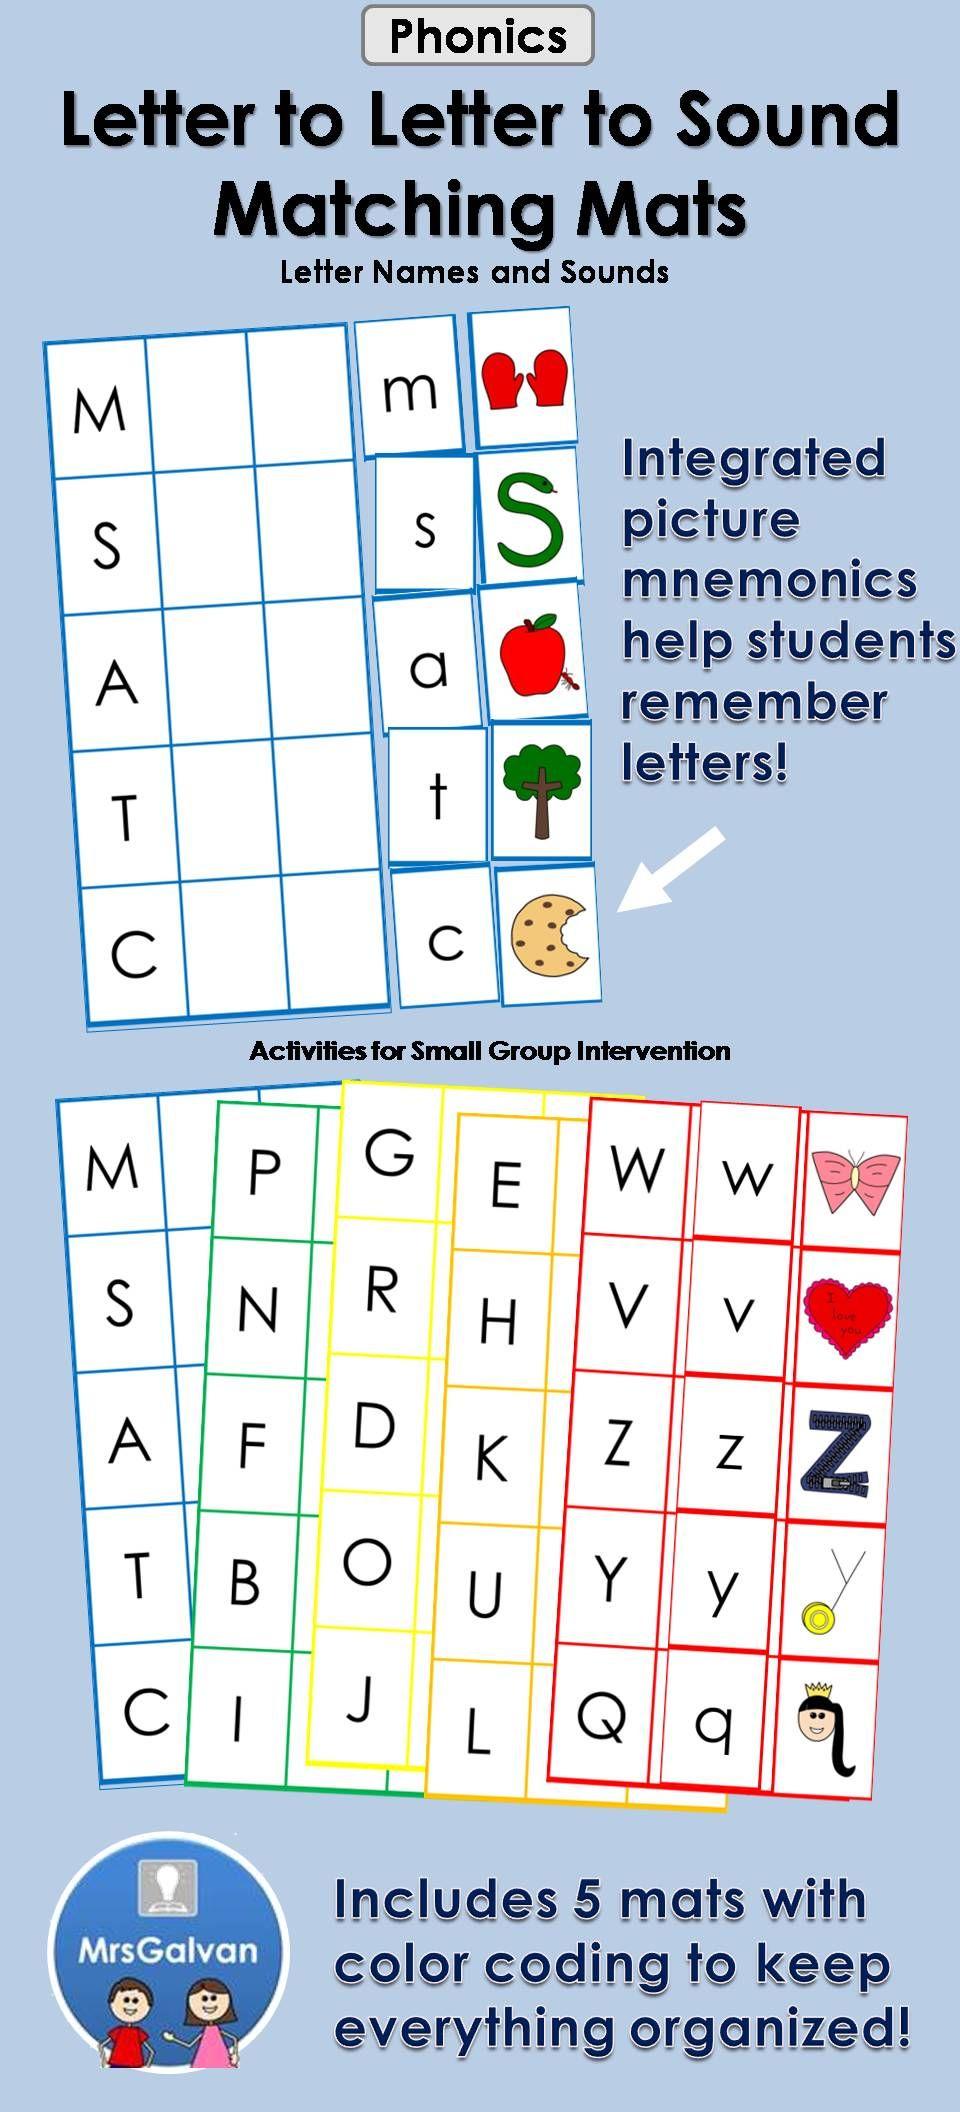 Kinder Garden: Alphabet Matching Mats For Letter Names And Beginning